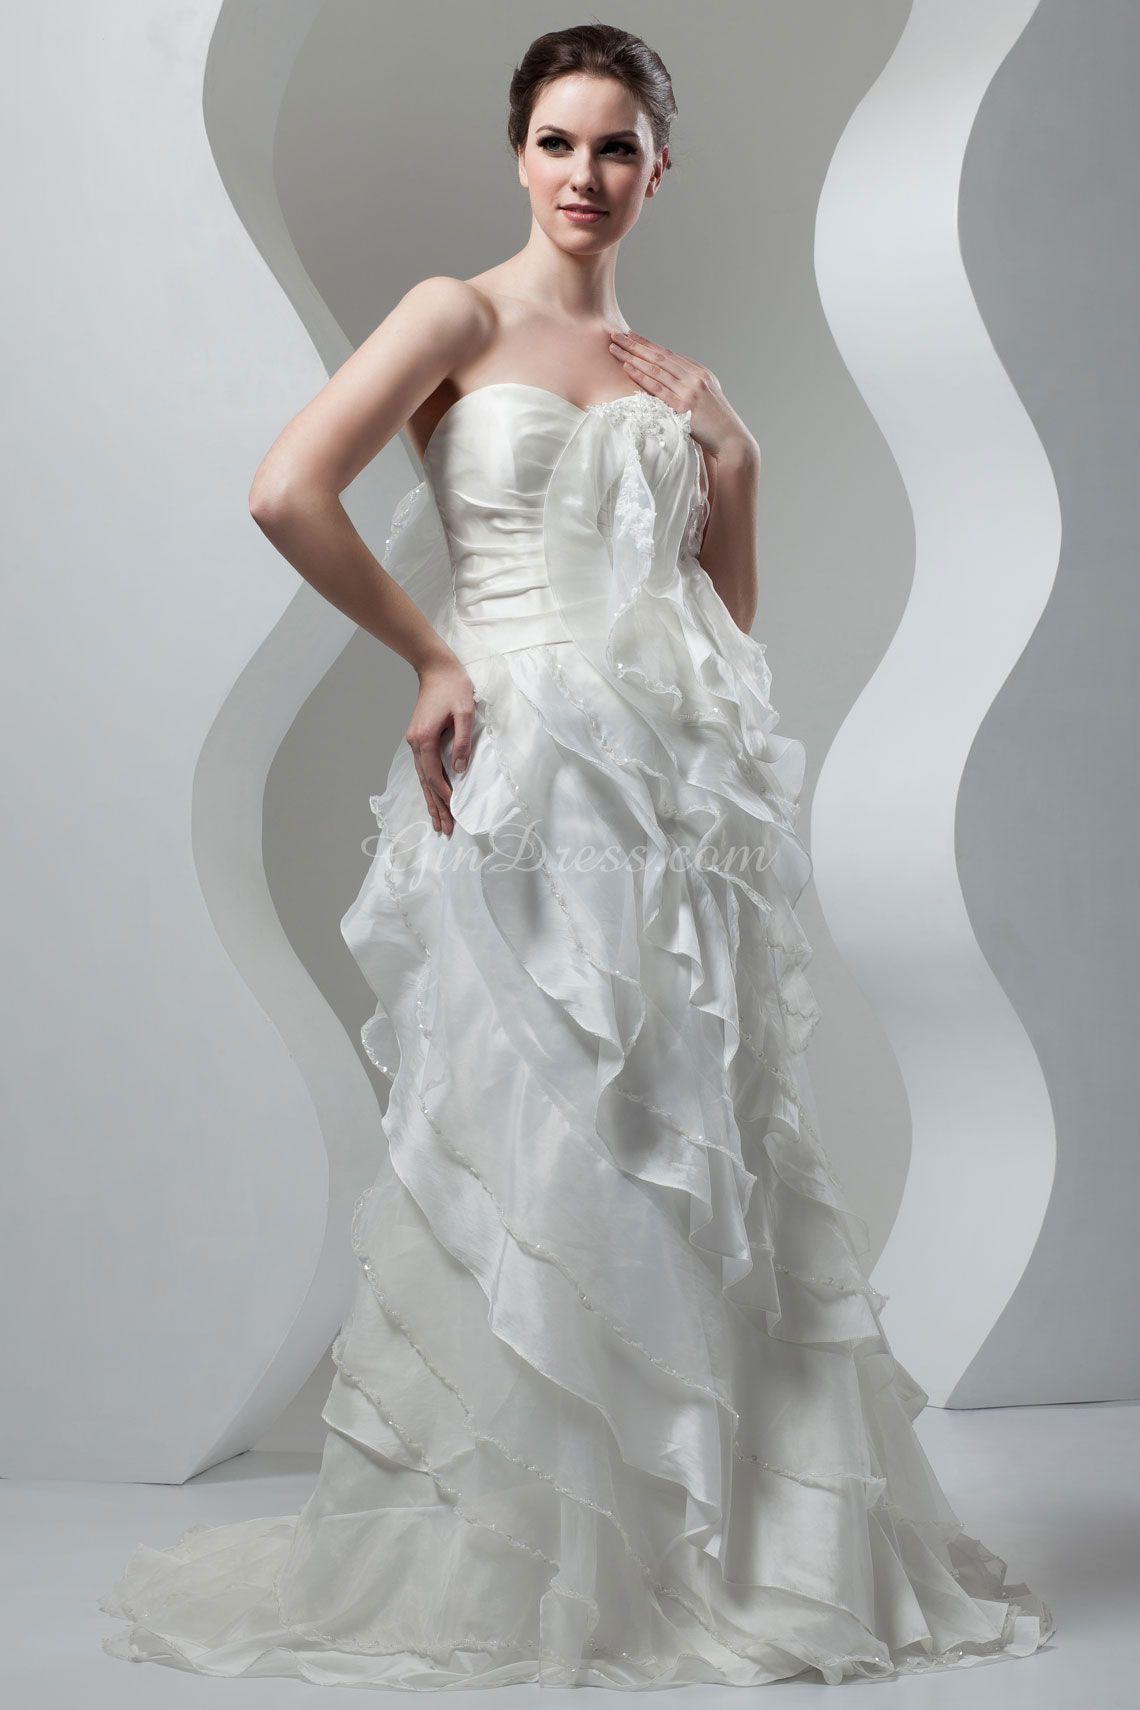 Wedding beach dress  beach wedding dresses beach wedding dresses  Weddinggg  Pinterest